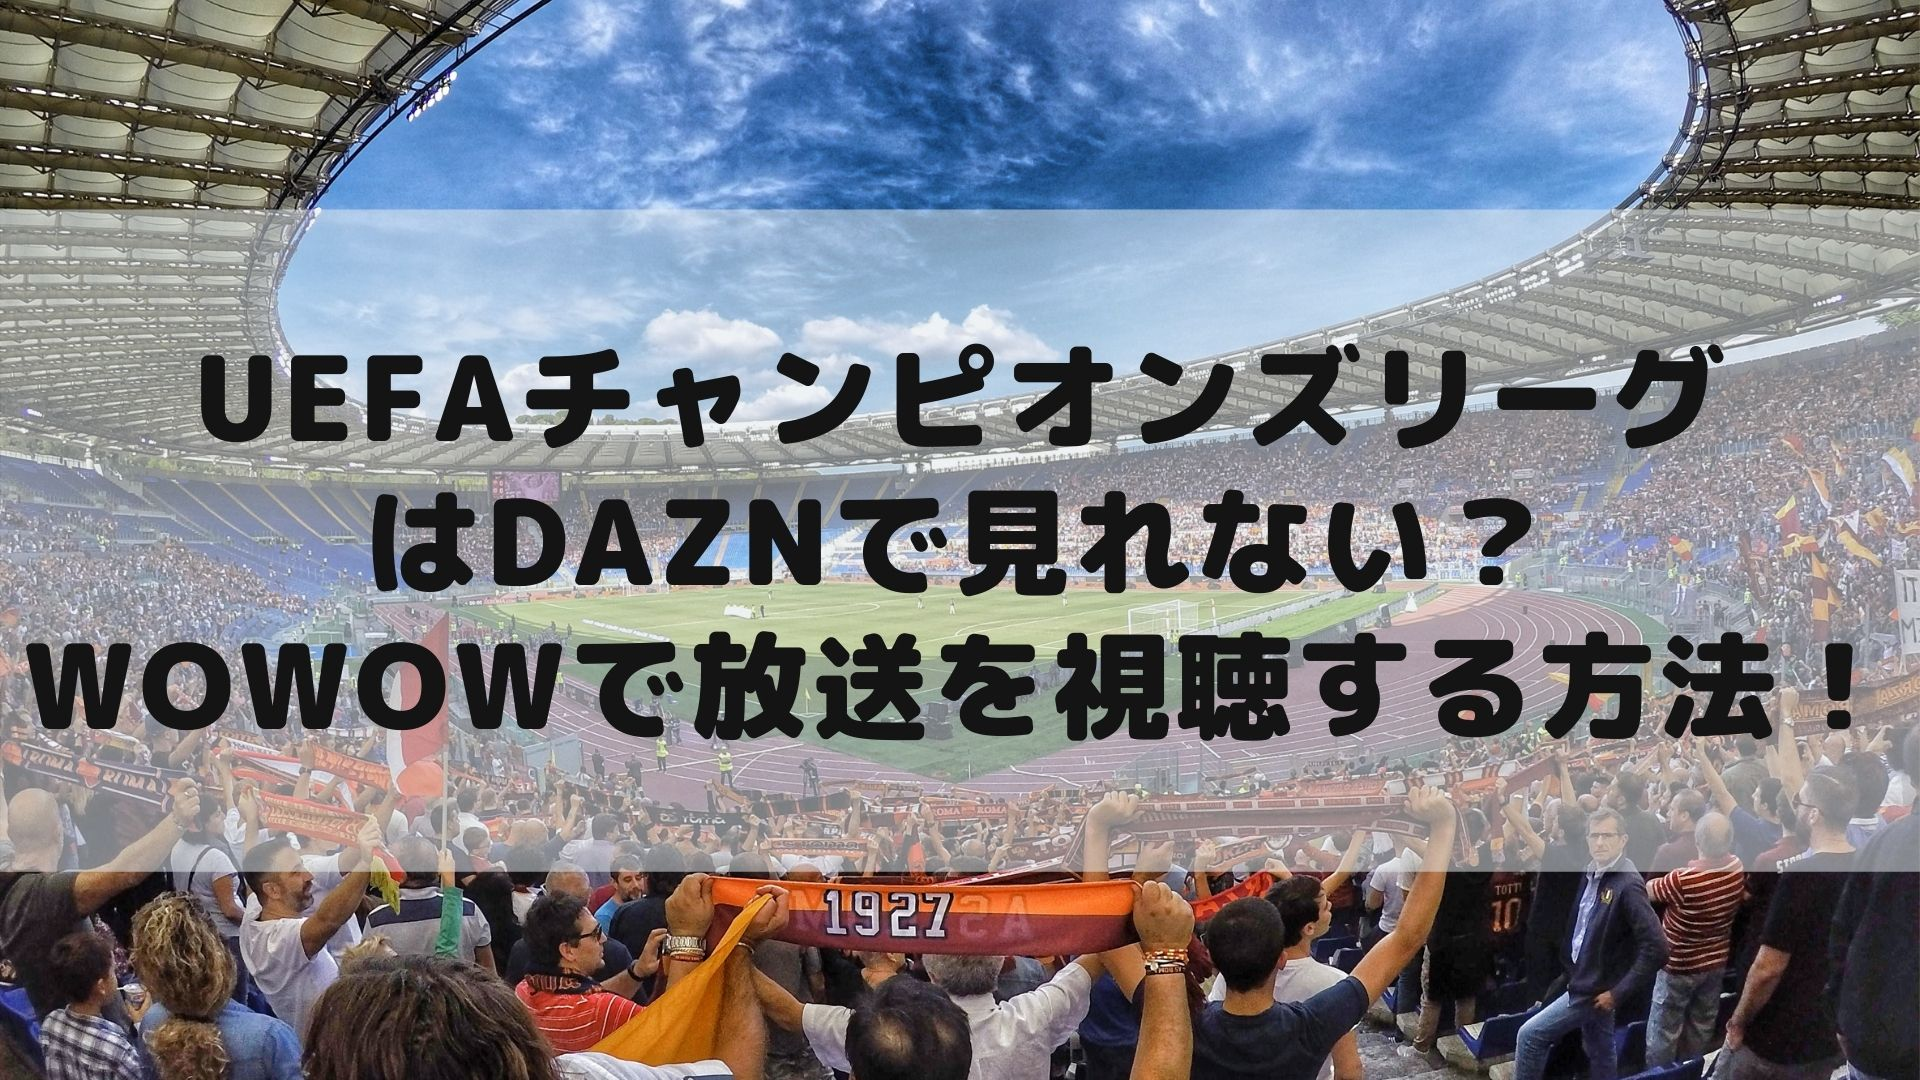 UEFAチャンピオンズリーグはDAZNで見れない?WOWOWで放送を視聴する方法タイトル画像